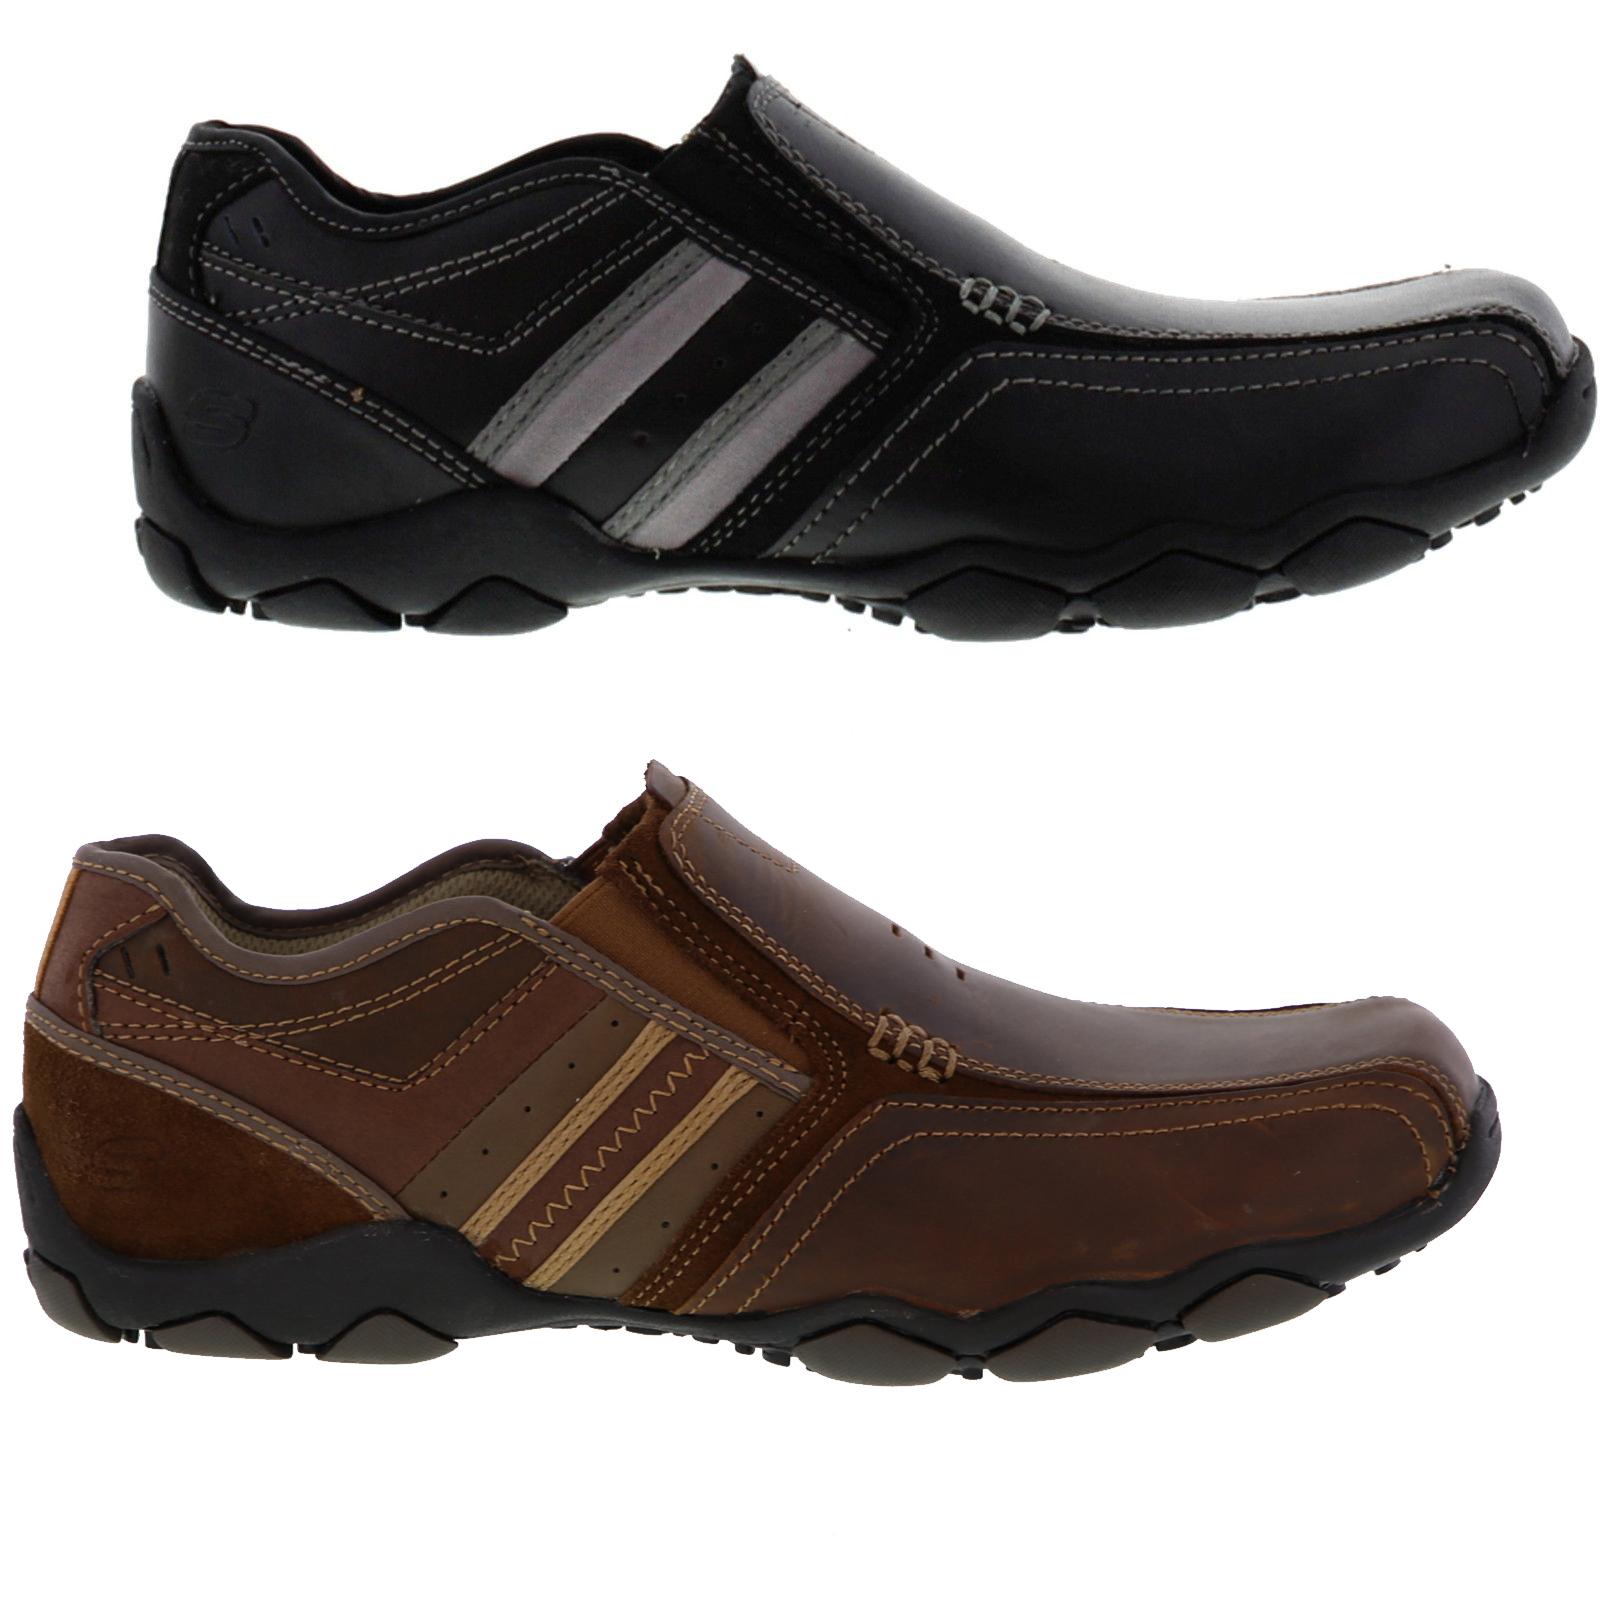 SKECHERS MEN'S DIAMETER Zinroy Slip On Casual Shoes Size 12 Brown 64275CDB